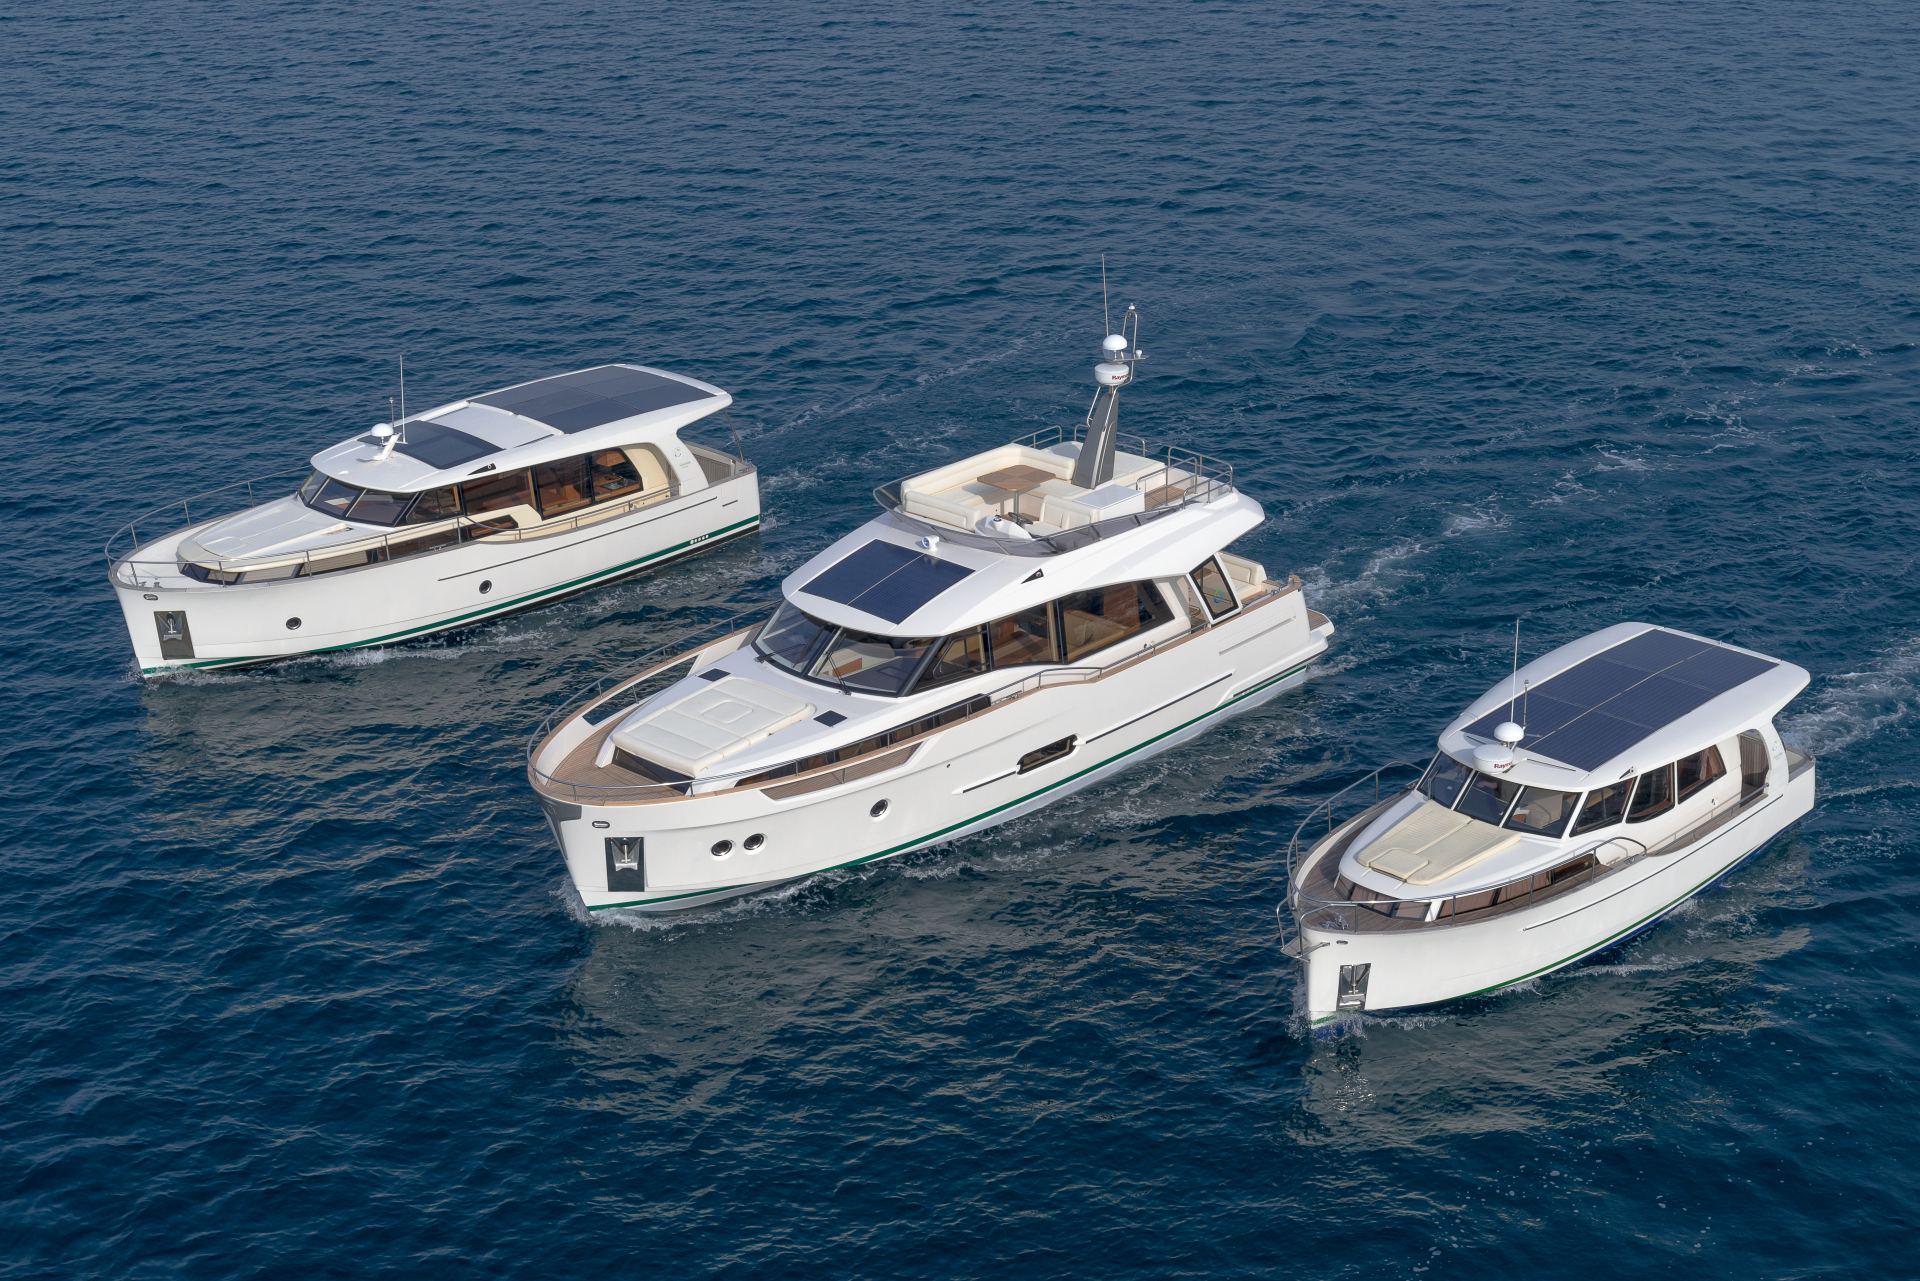 Greenline, Hybrid Yachts